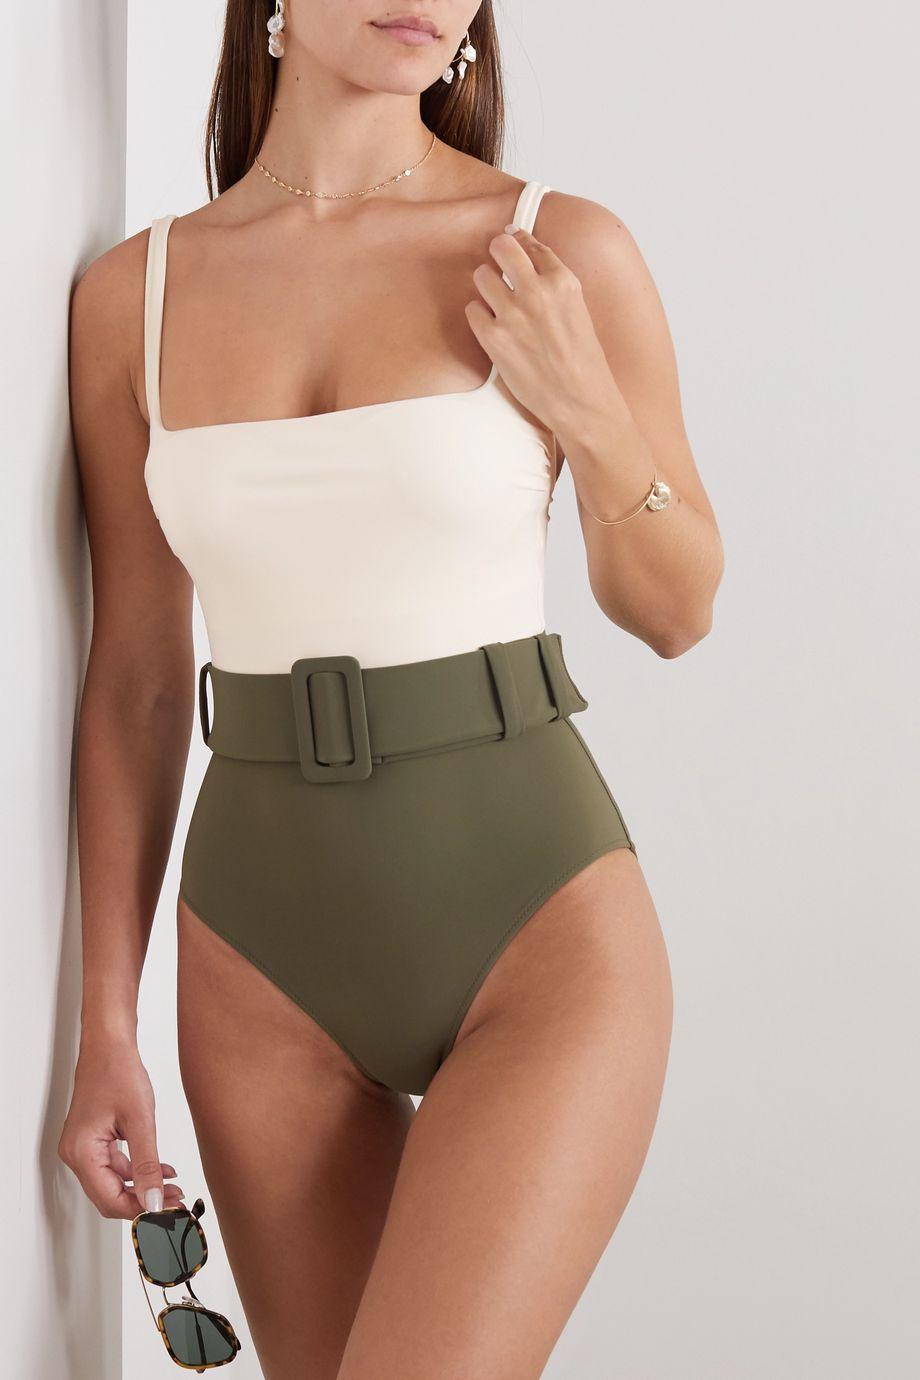 Evarae Cassandra belted two-tone swimsuit